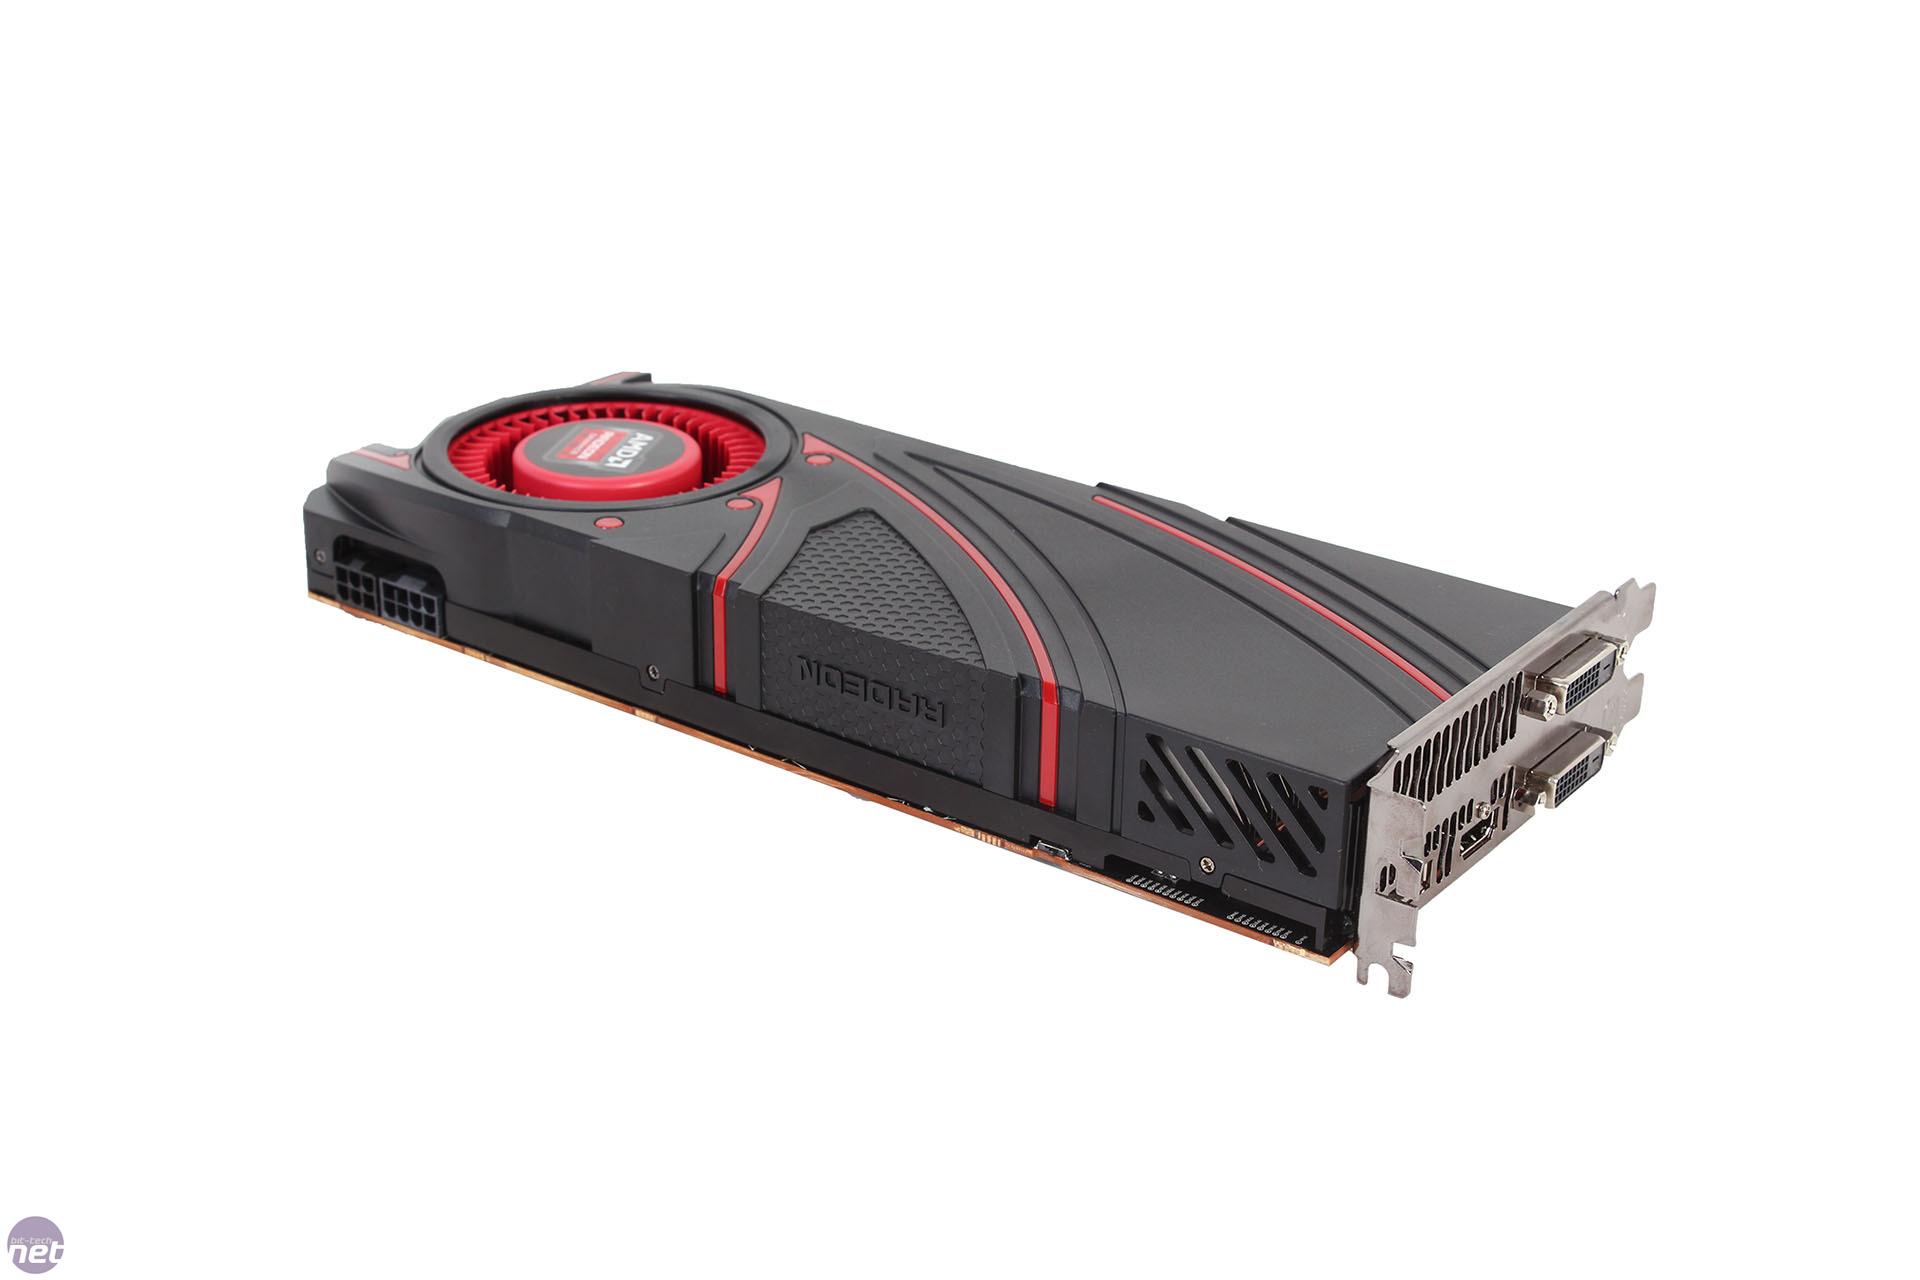 Configure PC w/ AMD Radeon R9 290X 4GB Video Card